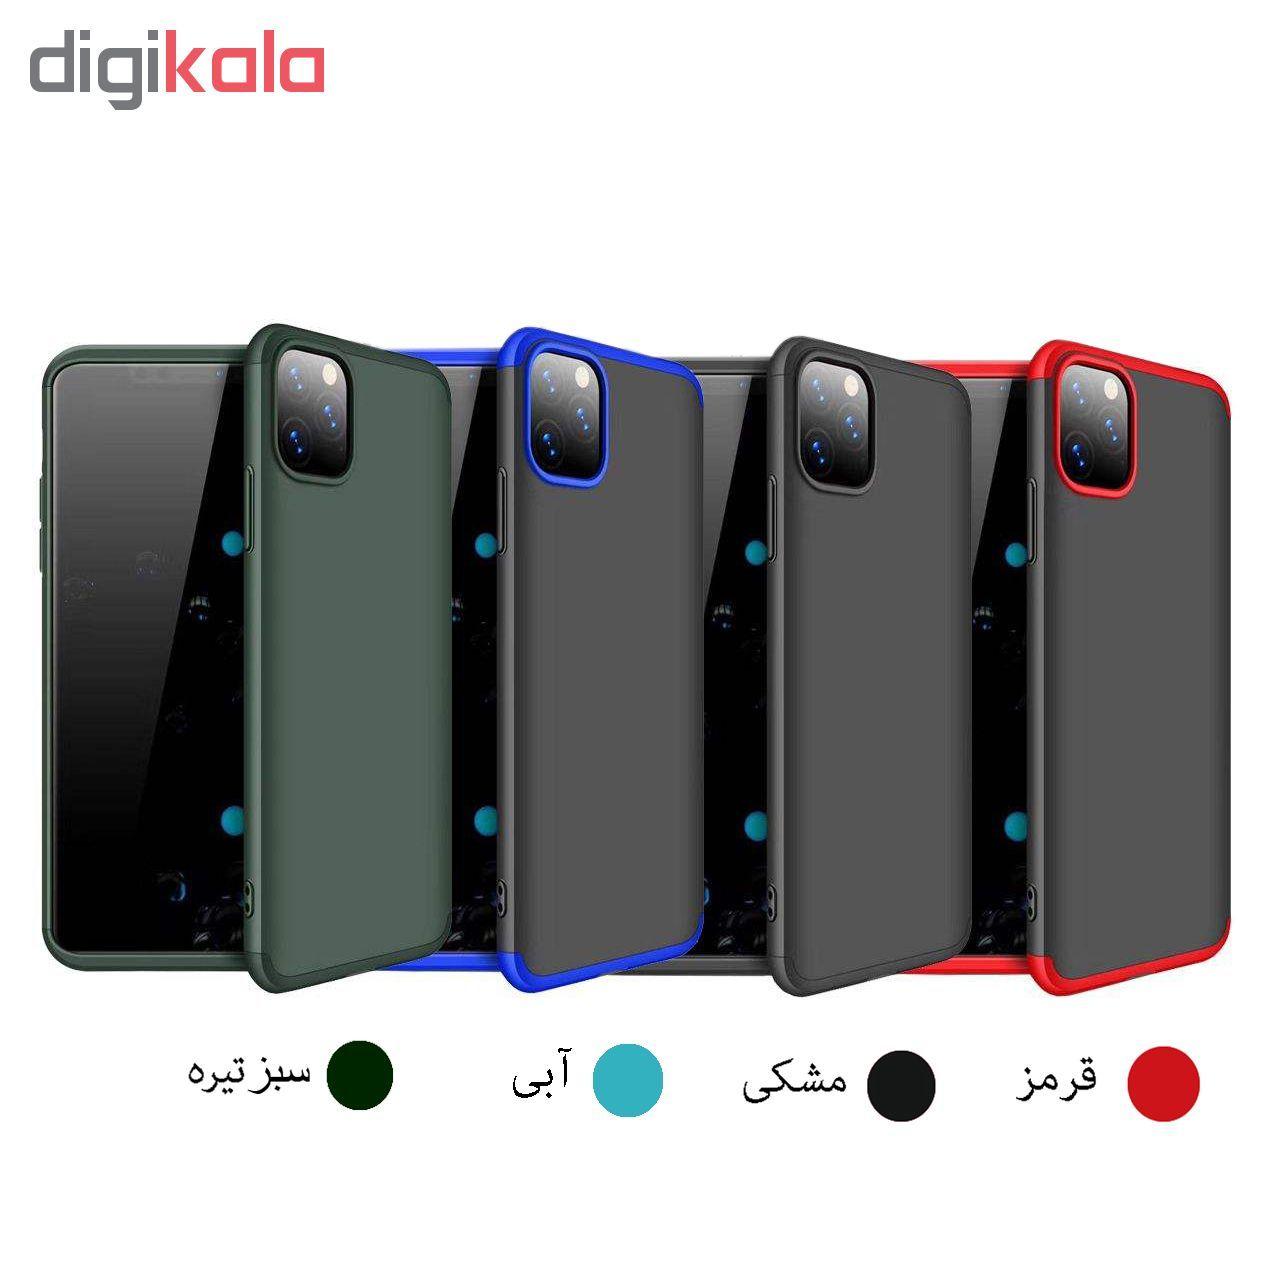 کاور 360 درجه جی کی کی مدل GK مناسب برای گوشی موبایل اپل IPhone 11 Pro Max main 1 1